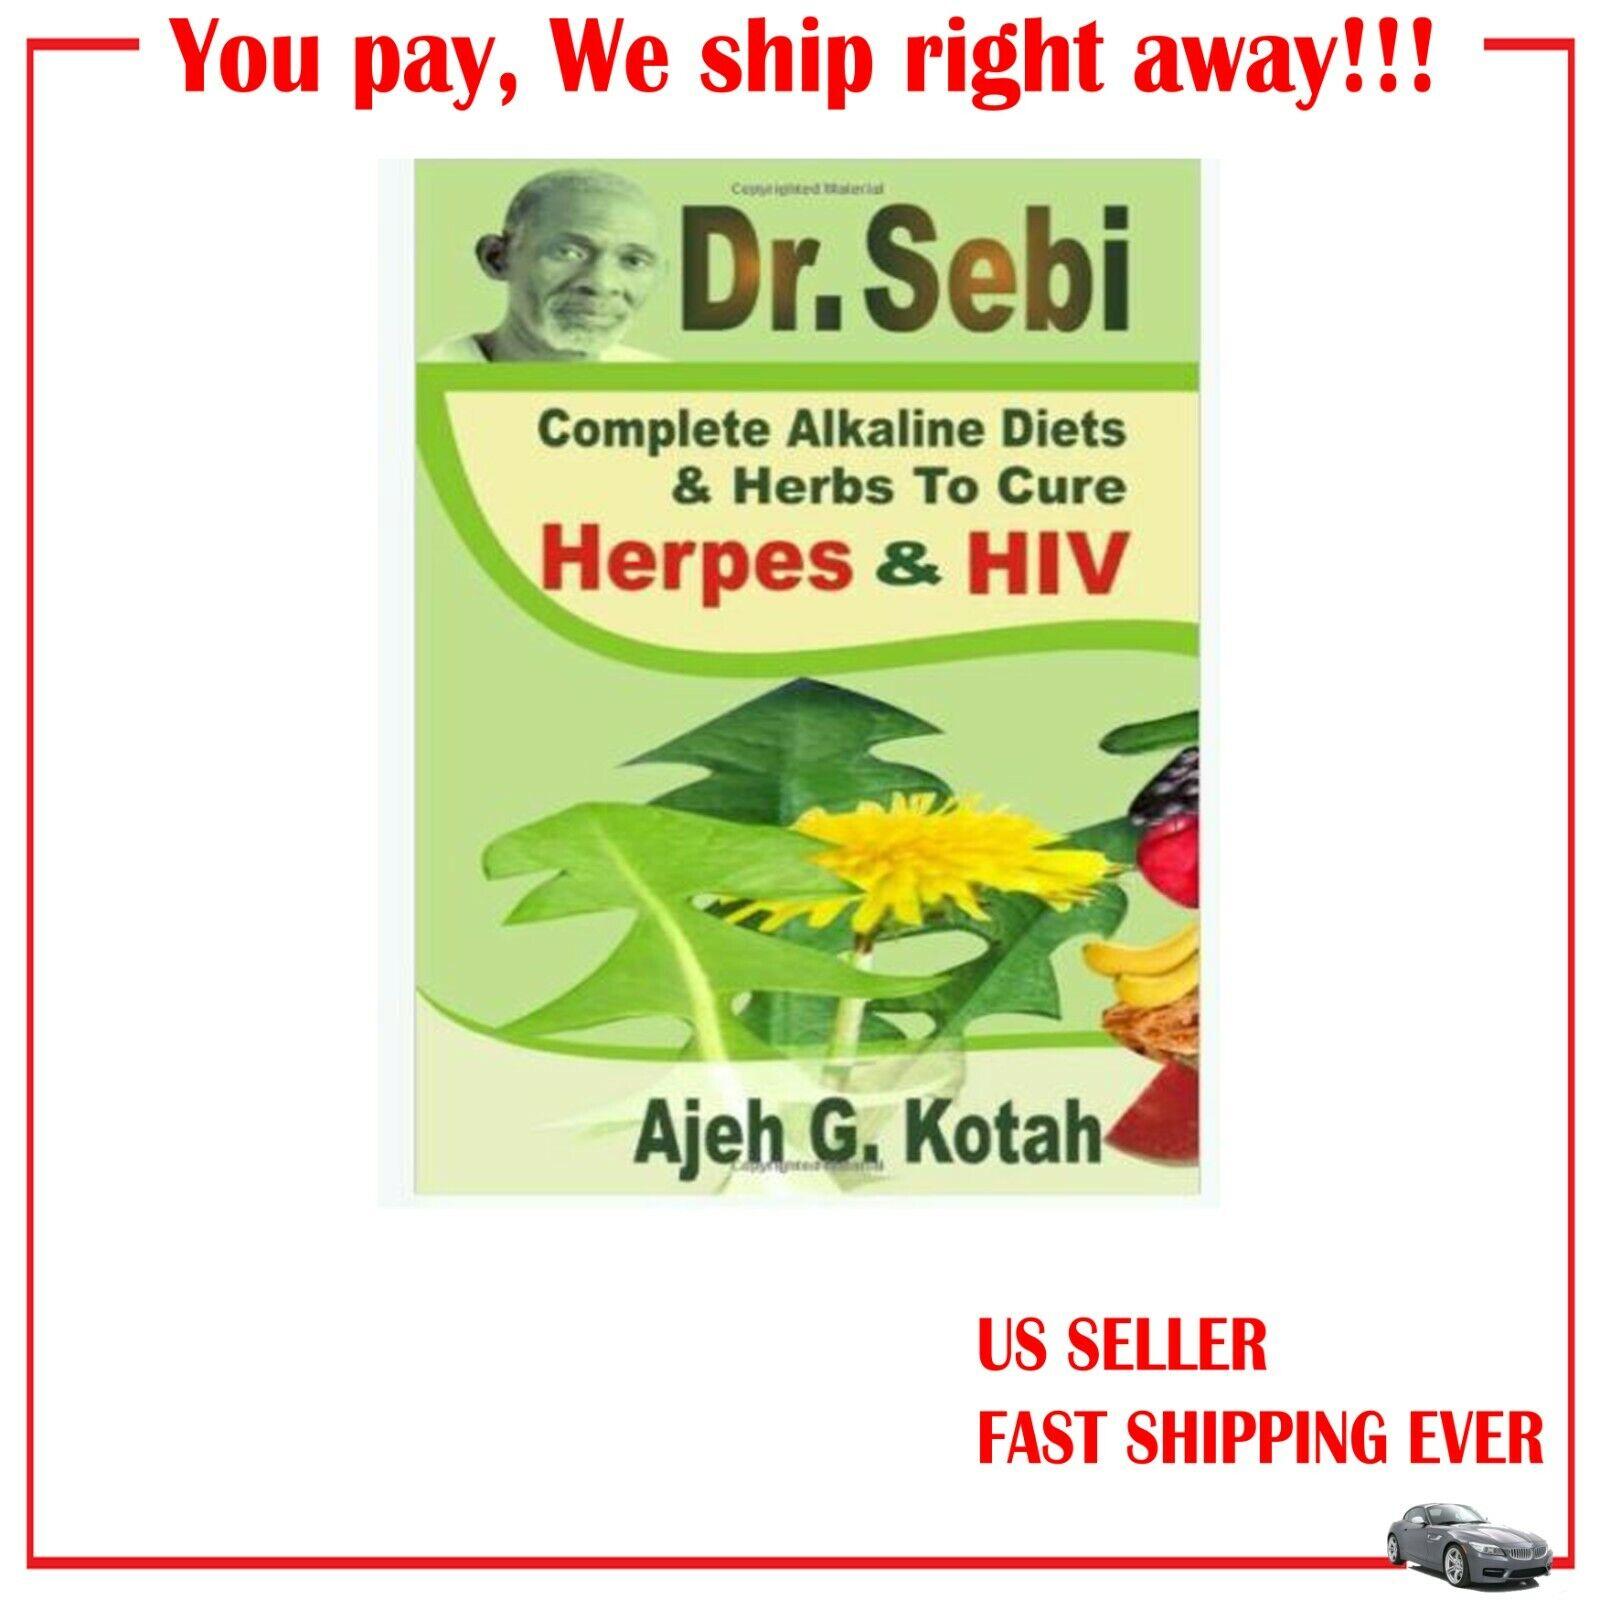 Dr. Sebi: Complete Alkaline Diets & Herbs to Cure Herpes & HIV Paperback, 2020 r